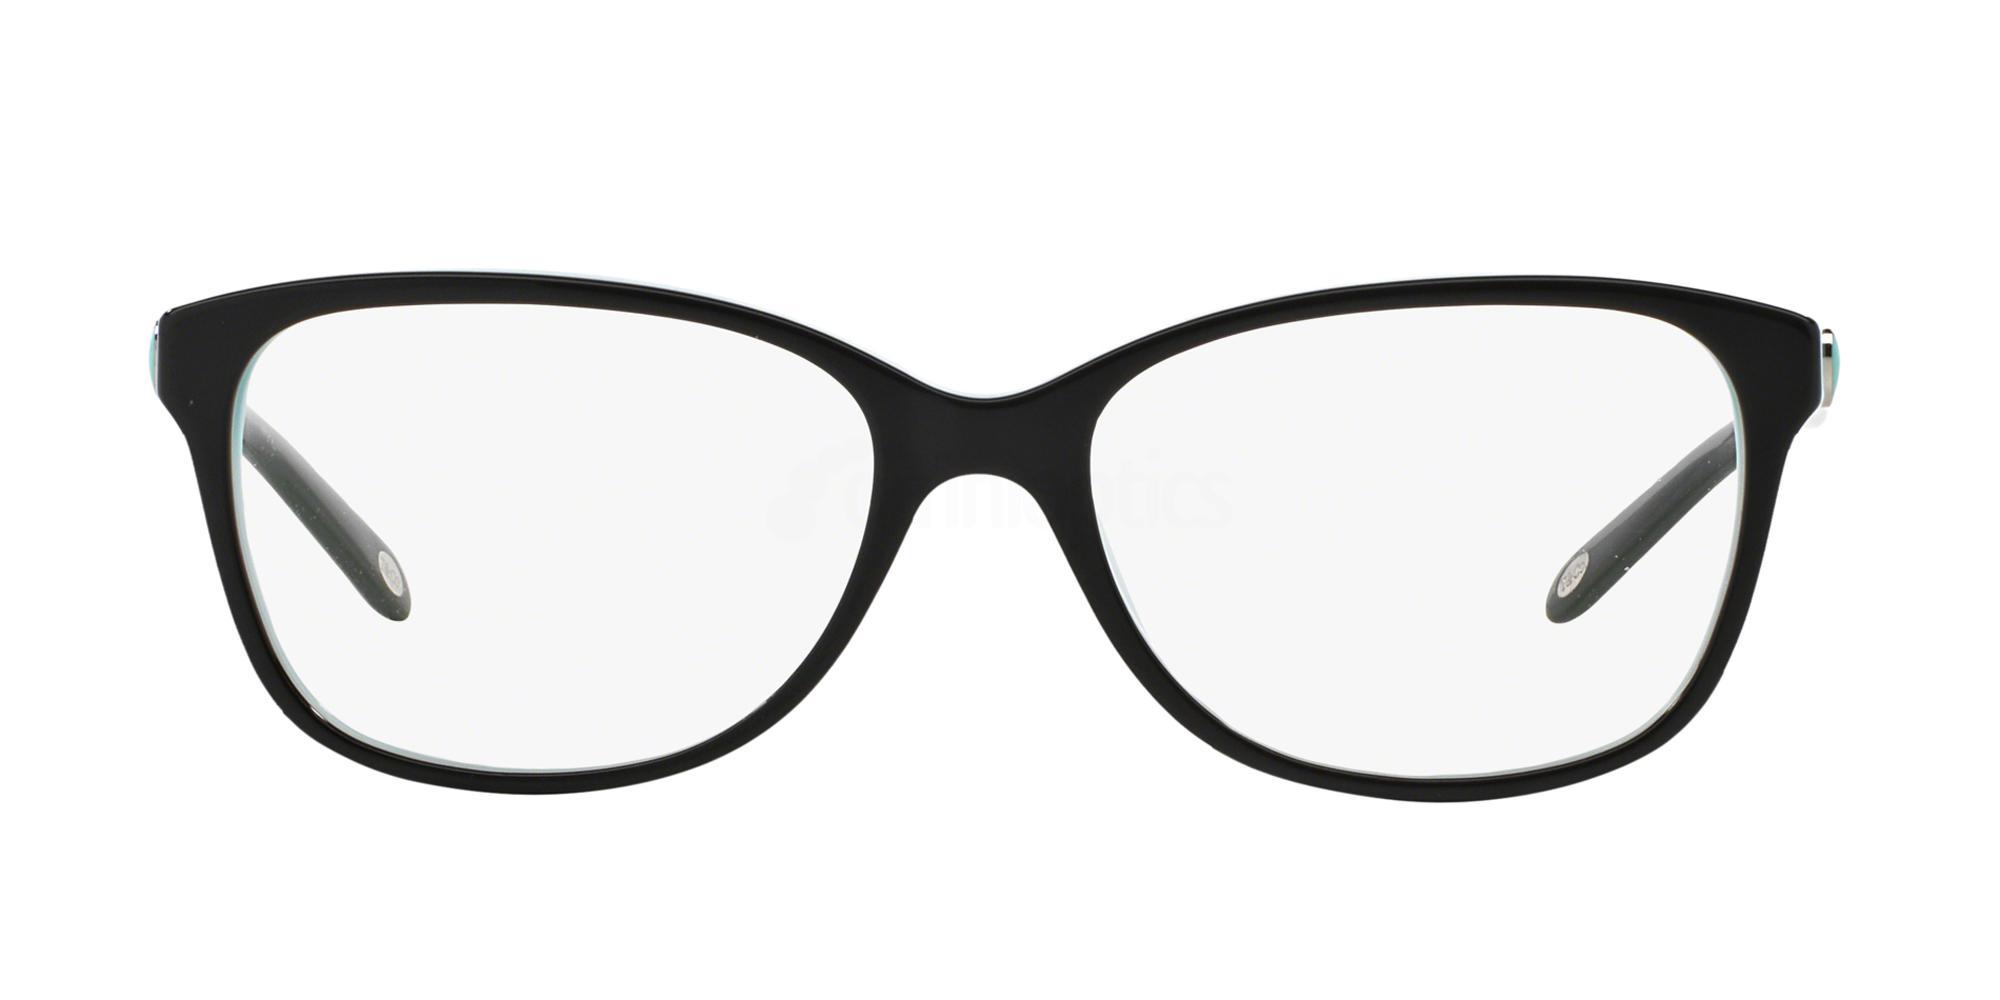 8055 TF2097 Glasses, Tiffany & Co.